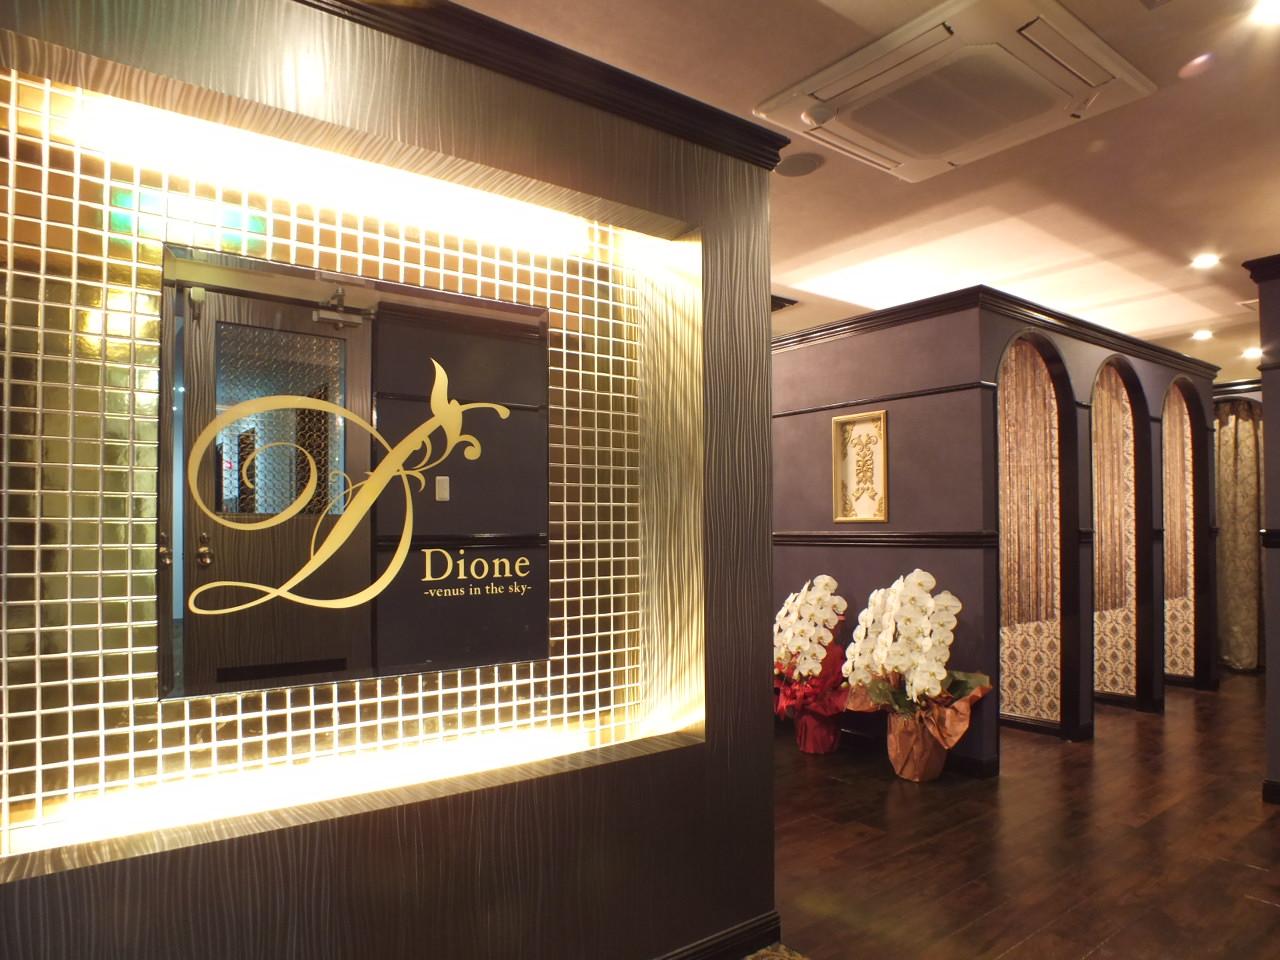 Dioneフランチャイズ店舗